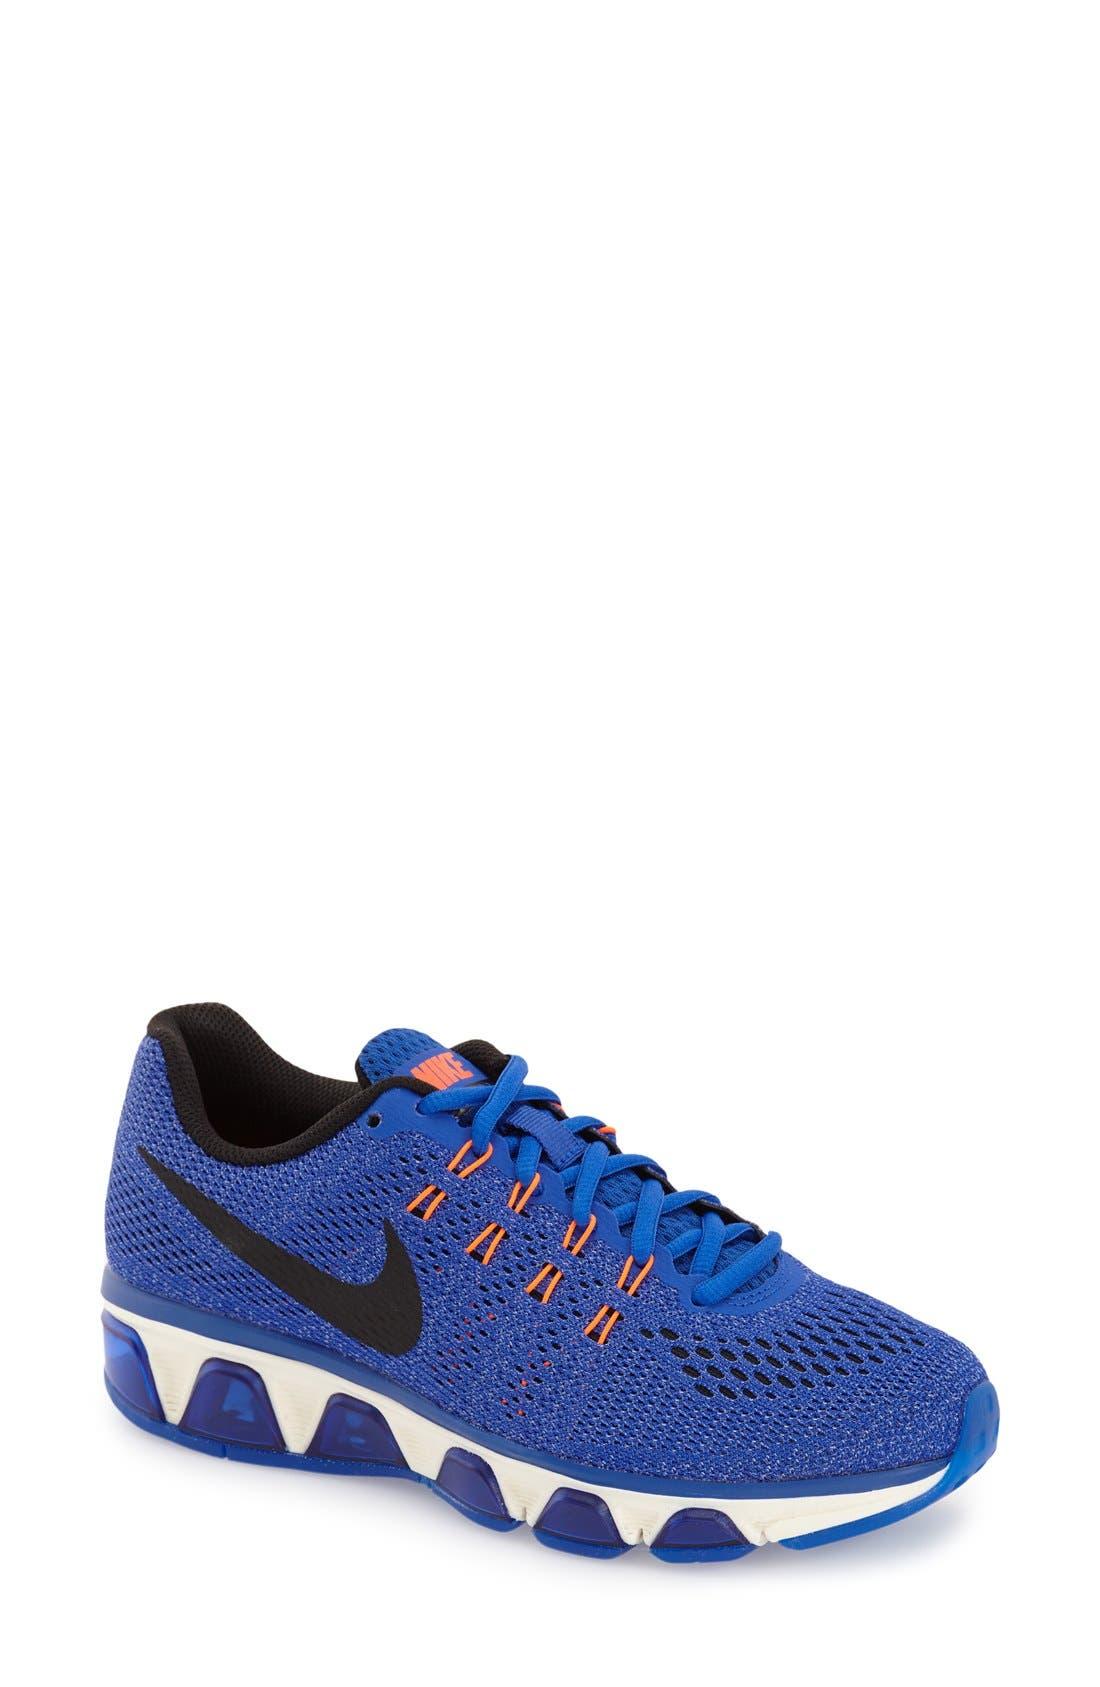 Main Image - Nike 'Air Max Tailwind 8' Running Shoe (Women)